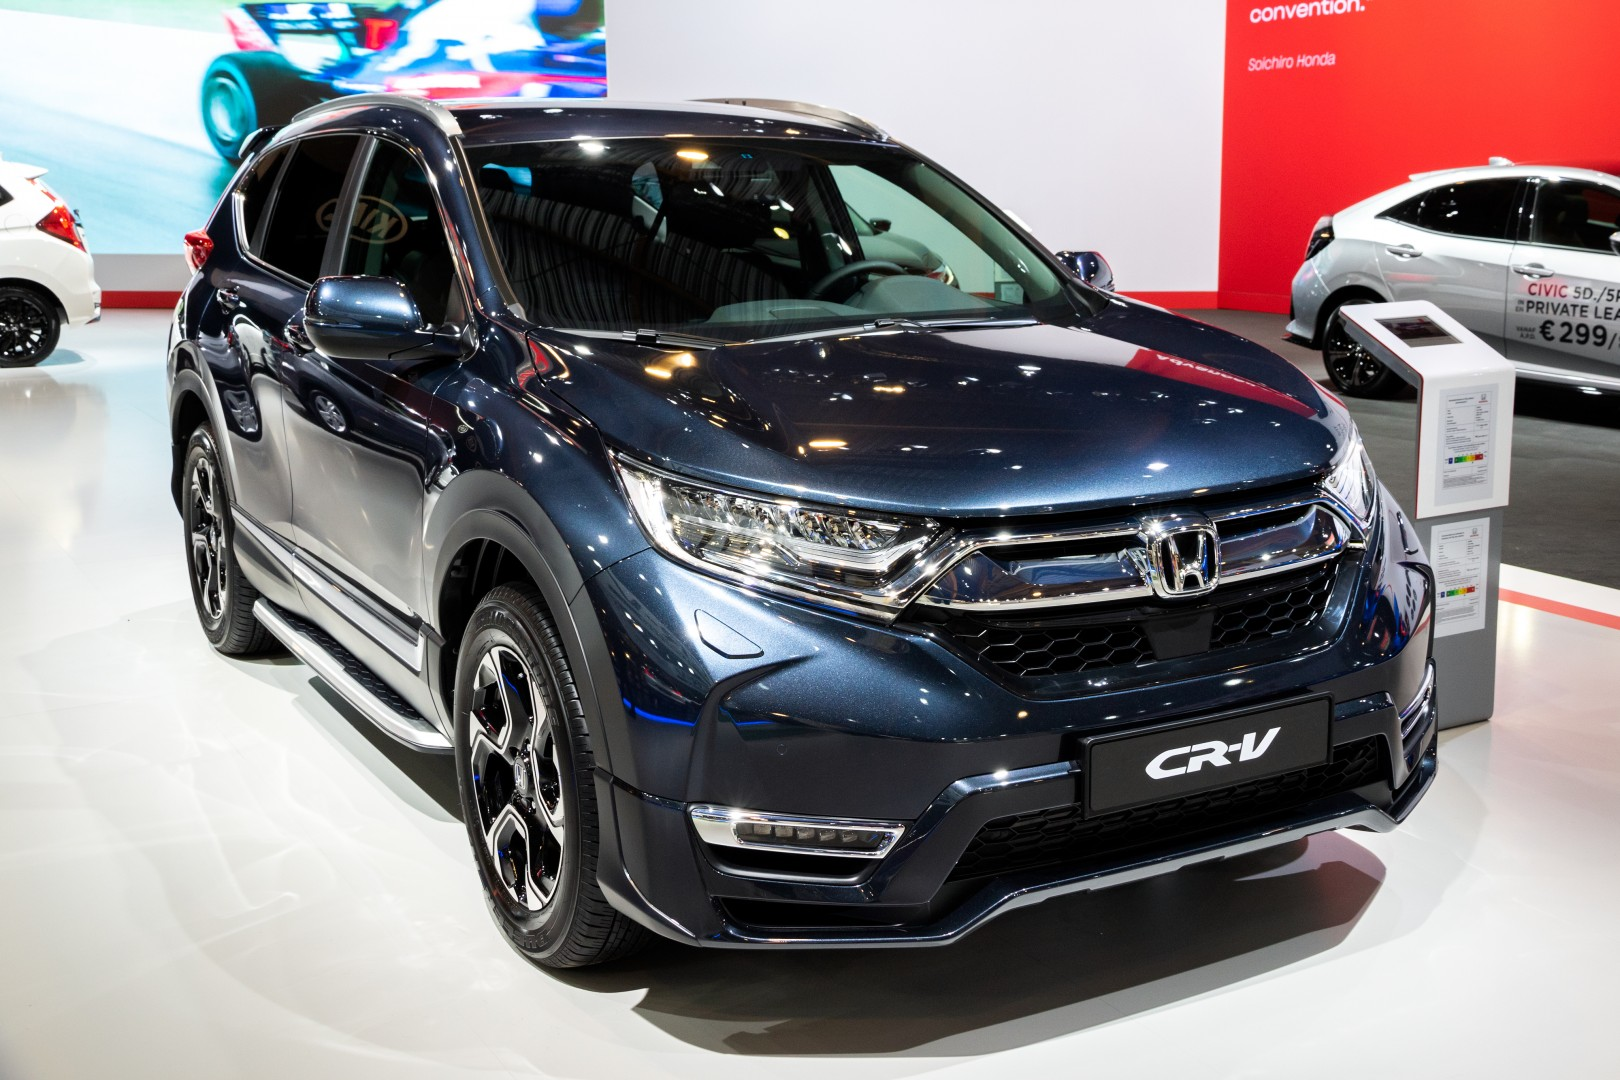 2019 Honda CR-V Brussels Motor Show